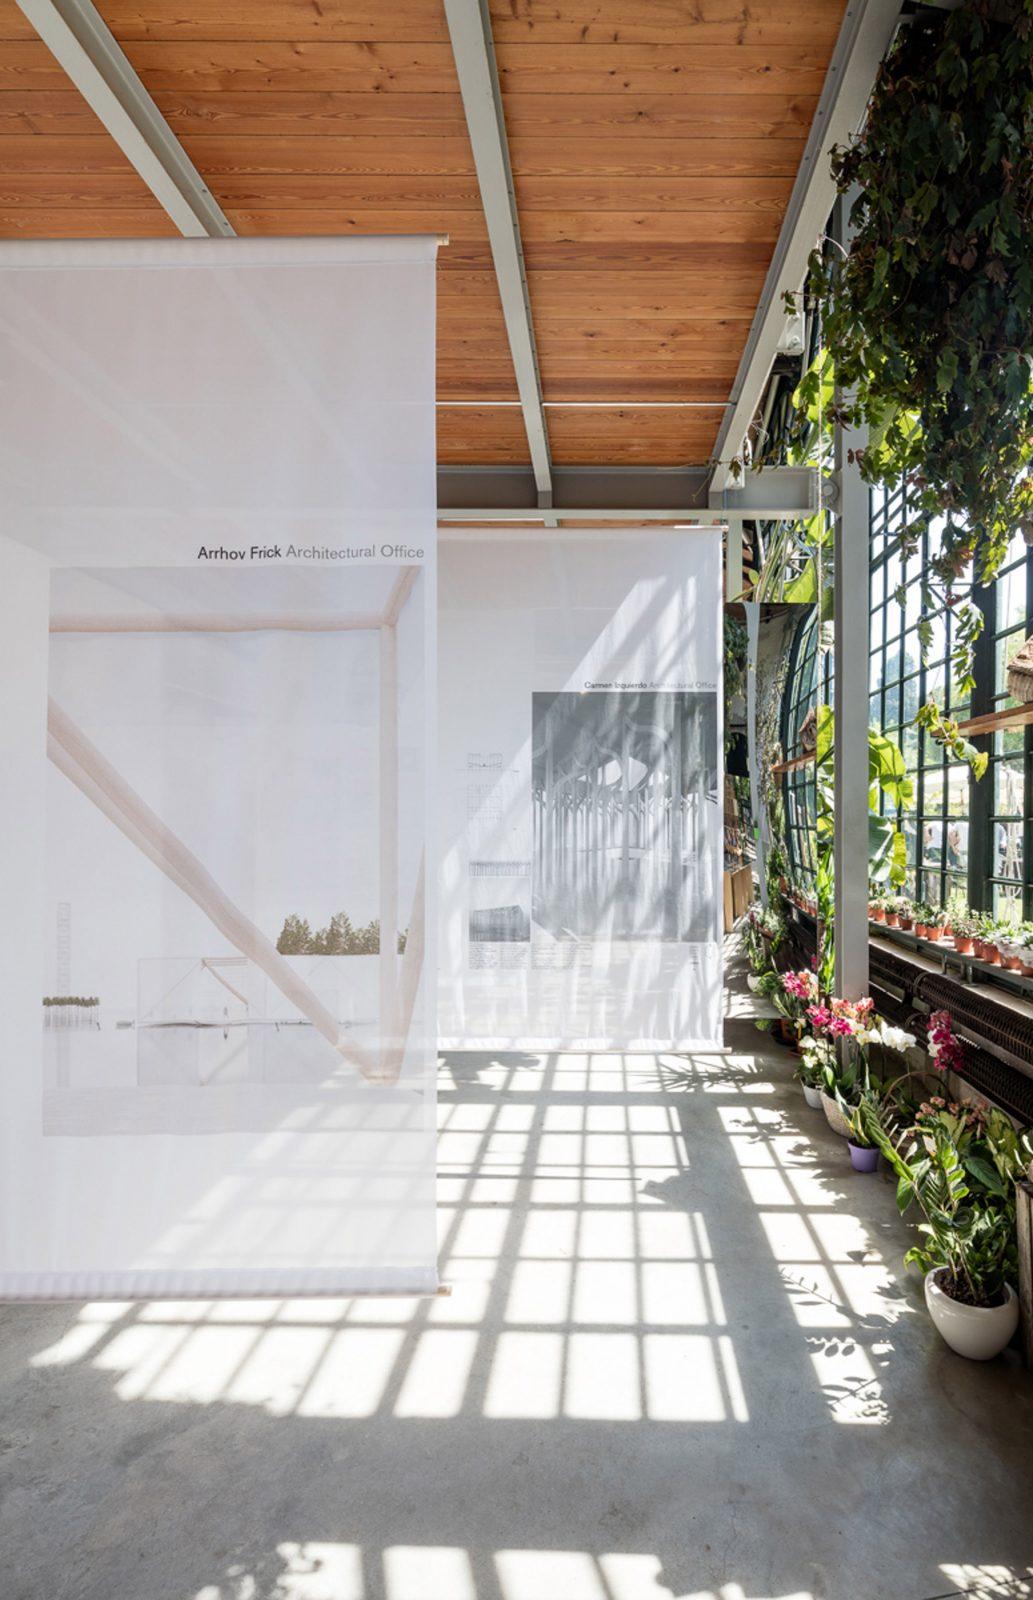 KjellanderSjoberg The Forests of Venice interior exhibition